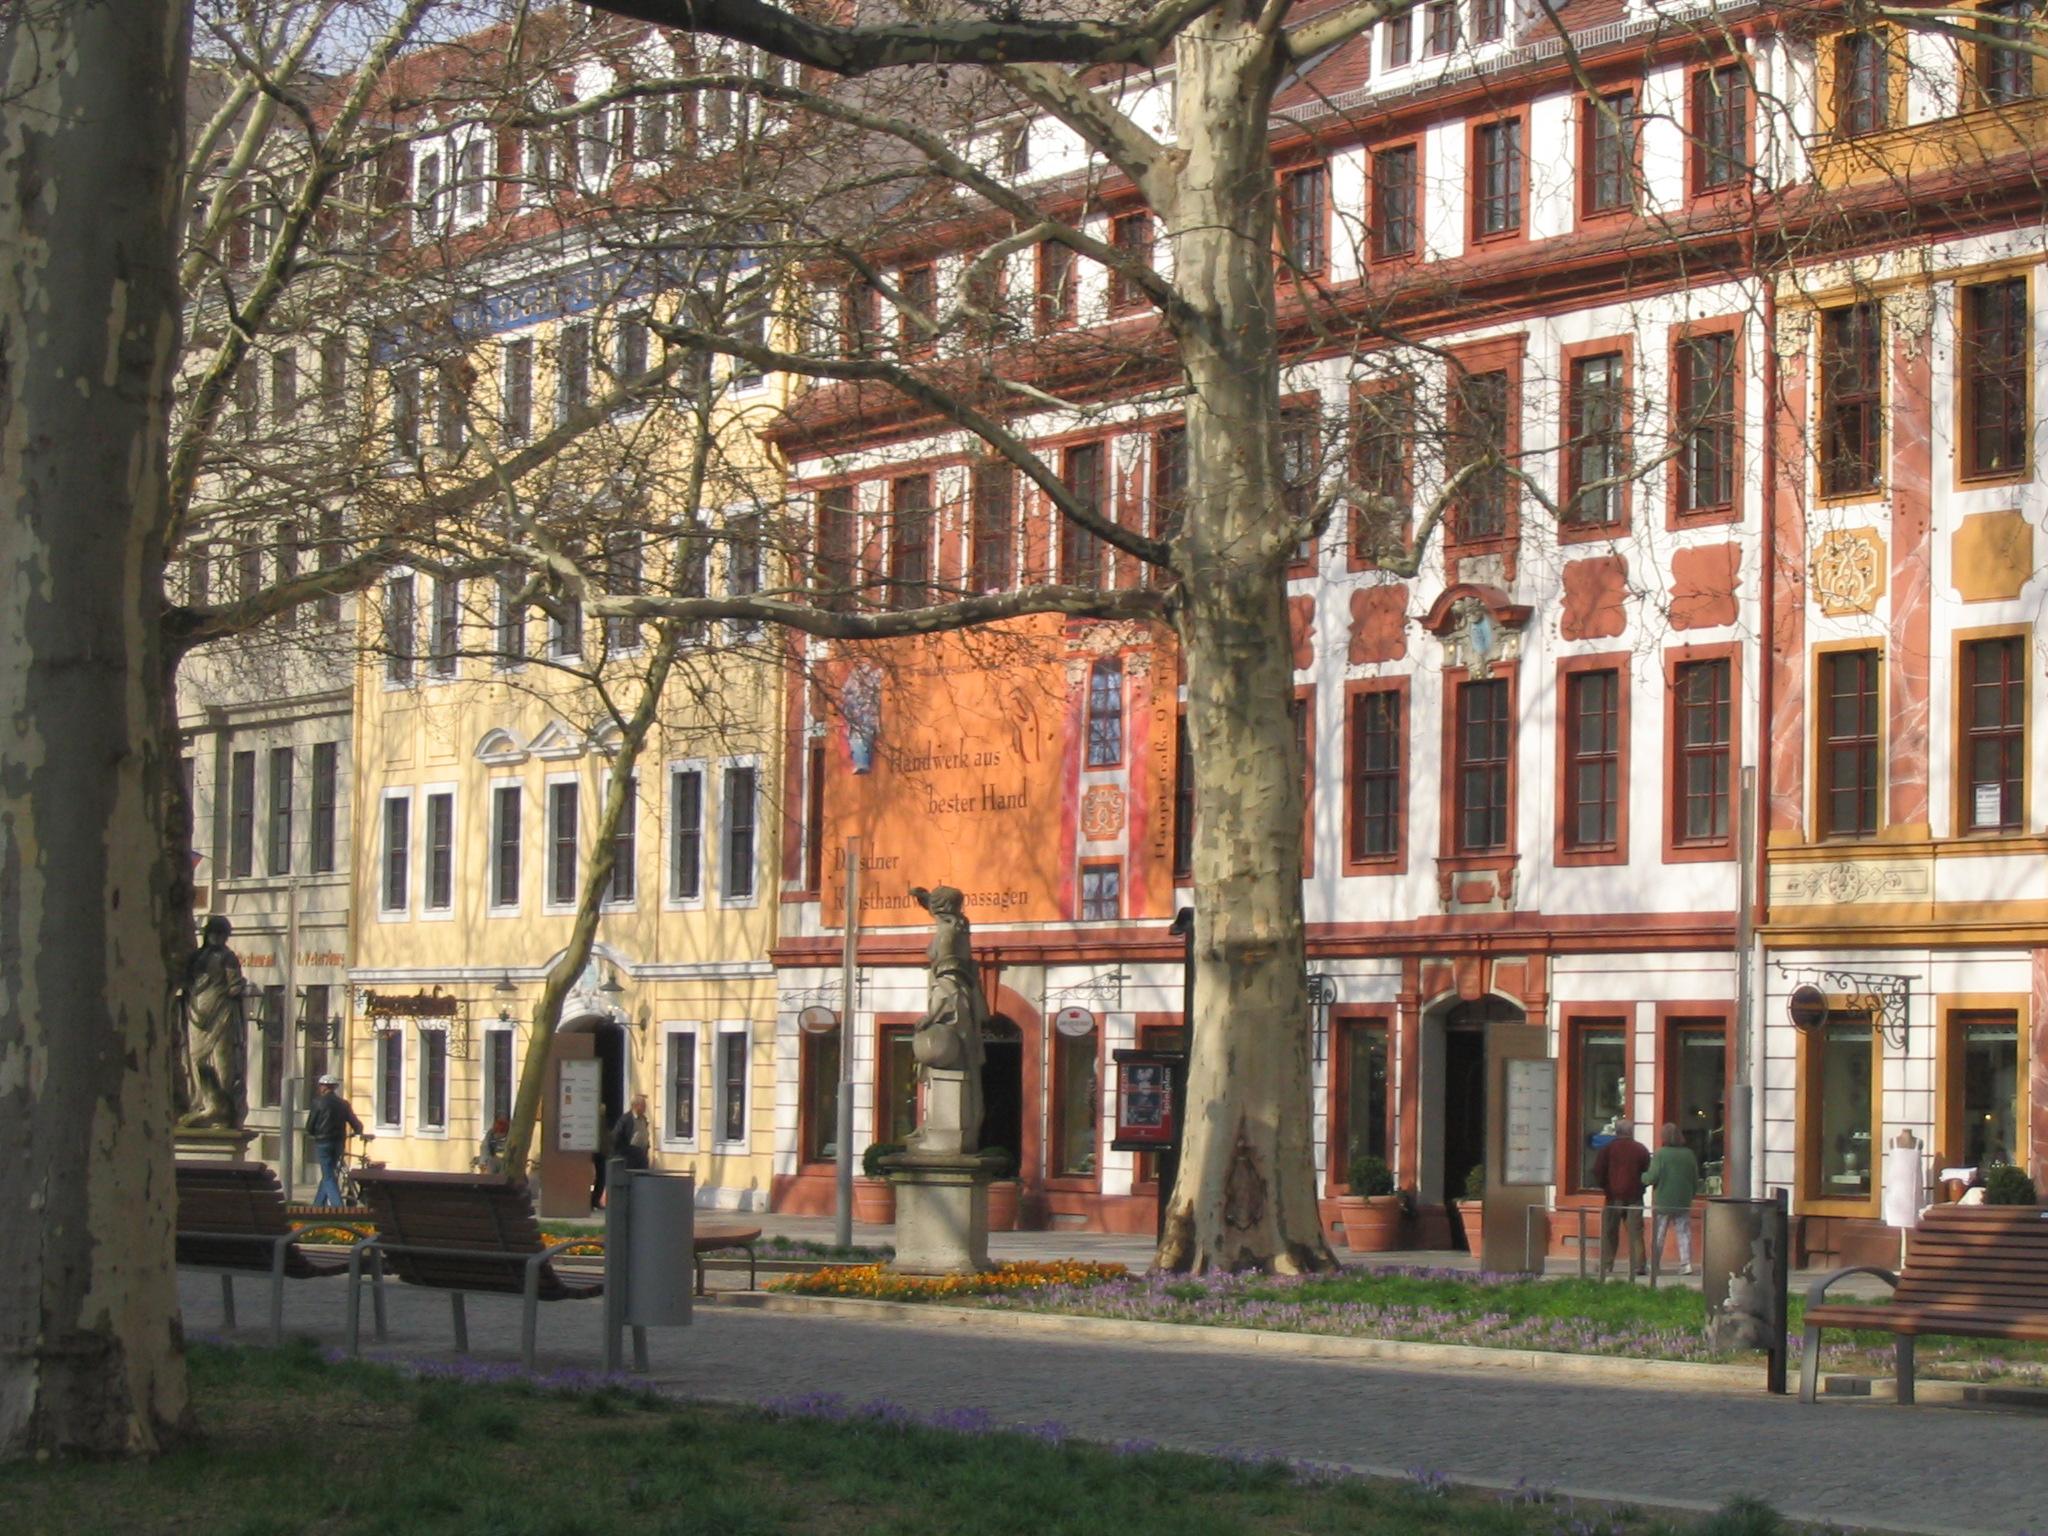 Die Innere Neustadt